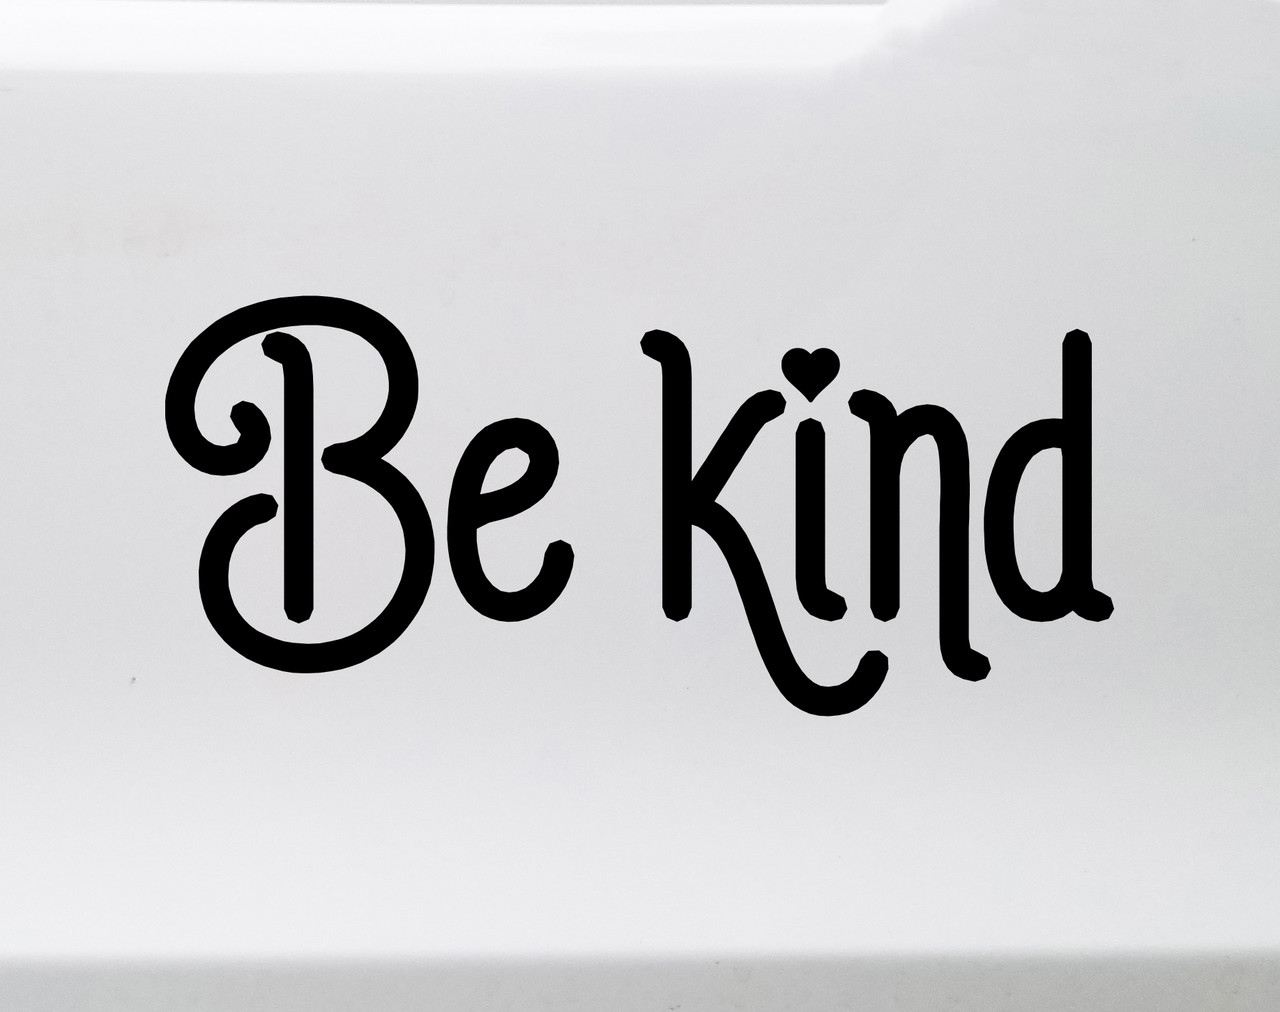 Be Kind Vinyl Decal V2 - Peace Love Hope Understanding Compassion - Die Cut Sticker